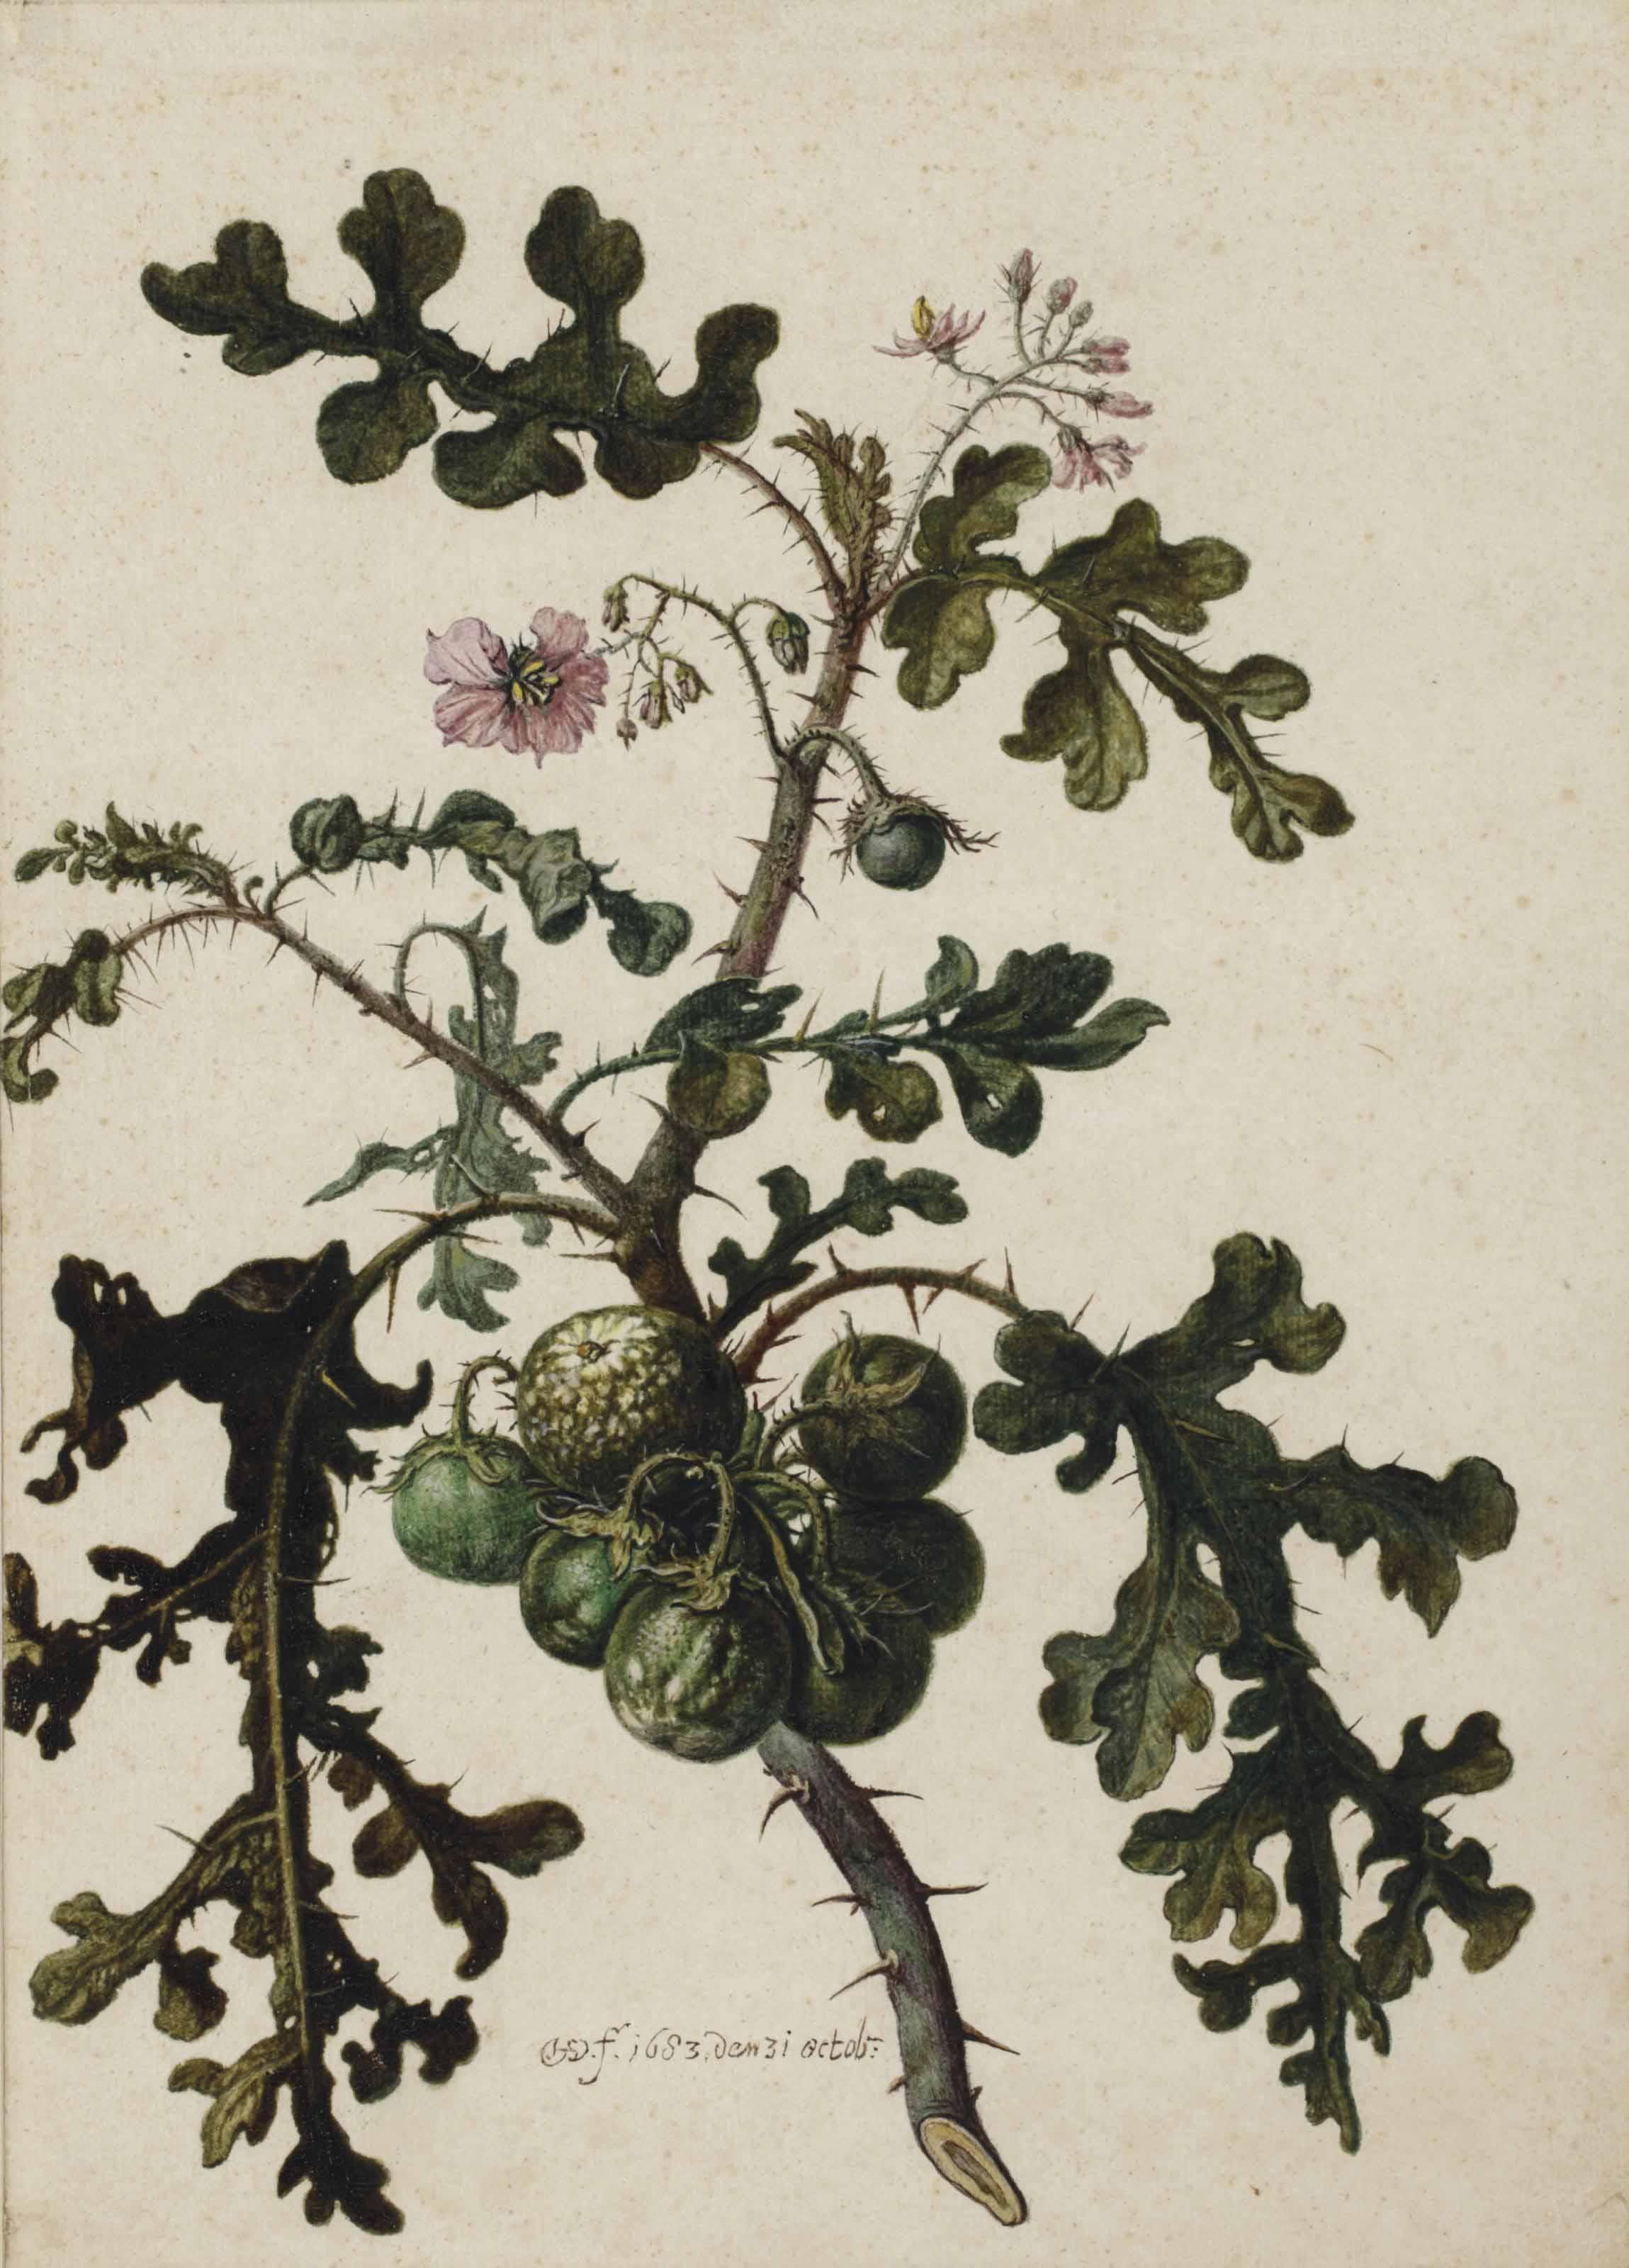 A litchi tomato (Solanum sisymbriifolium)